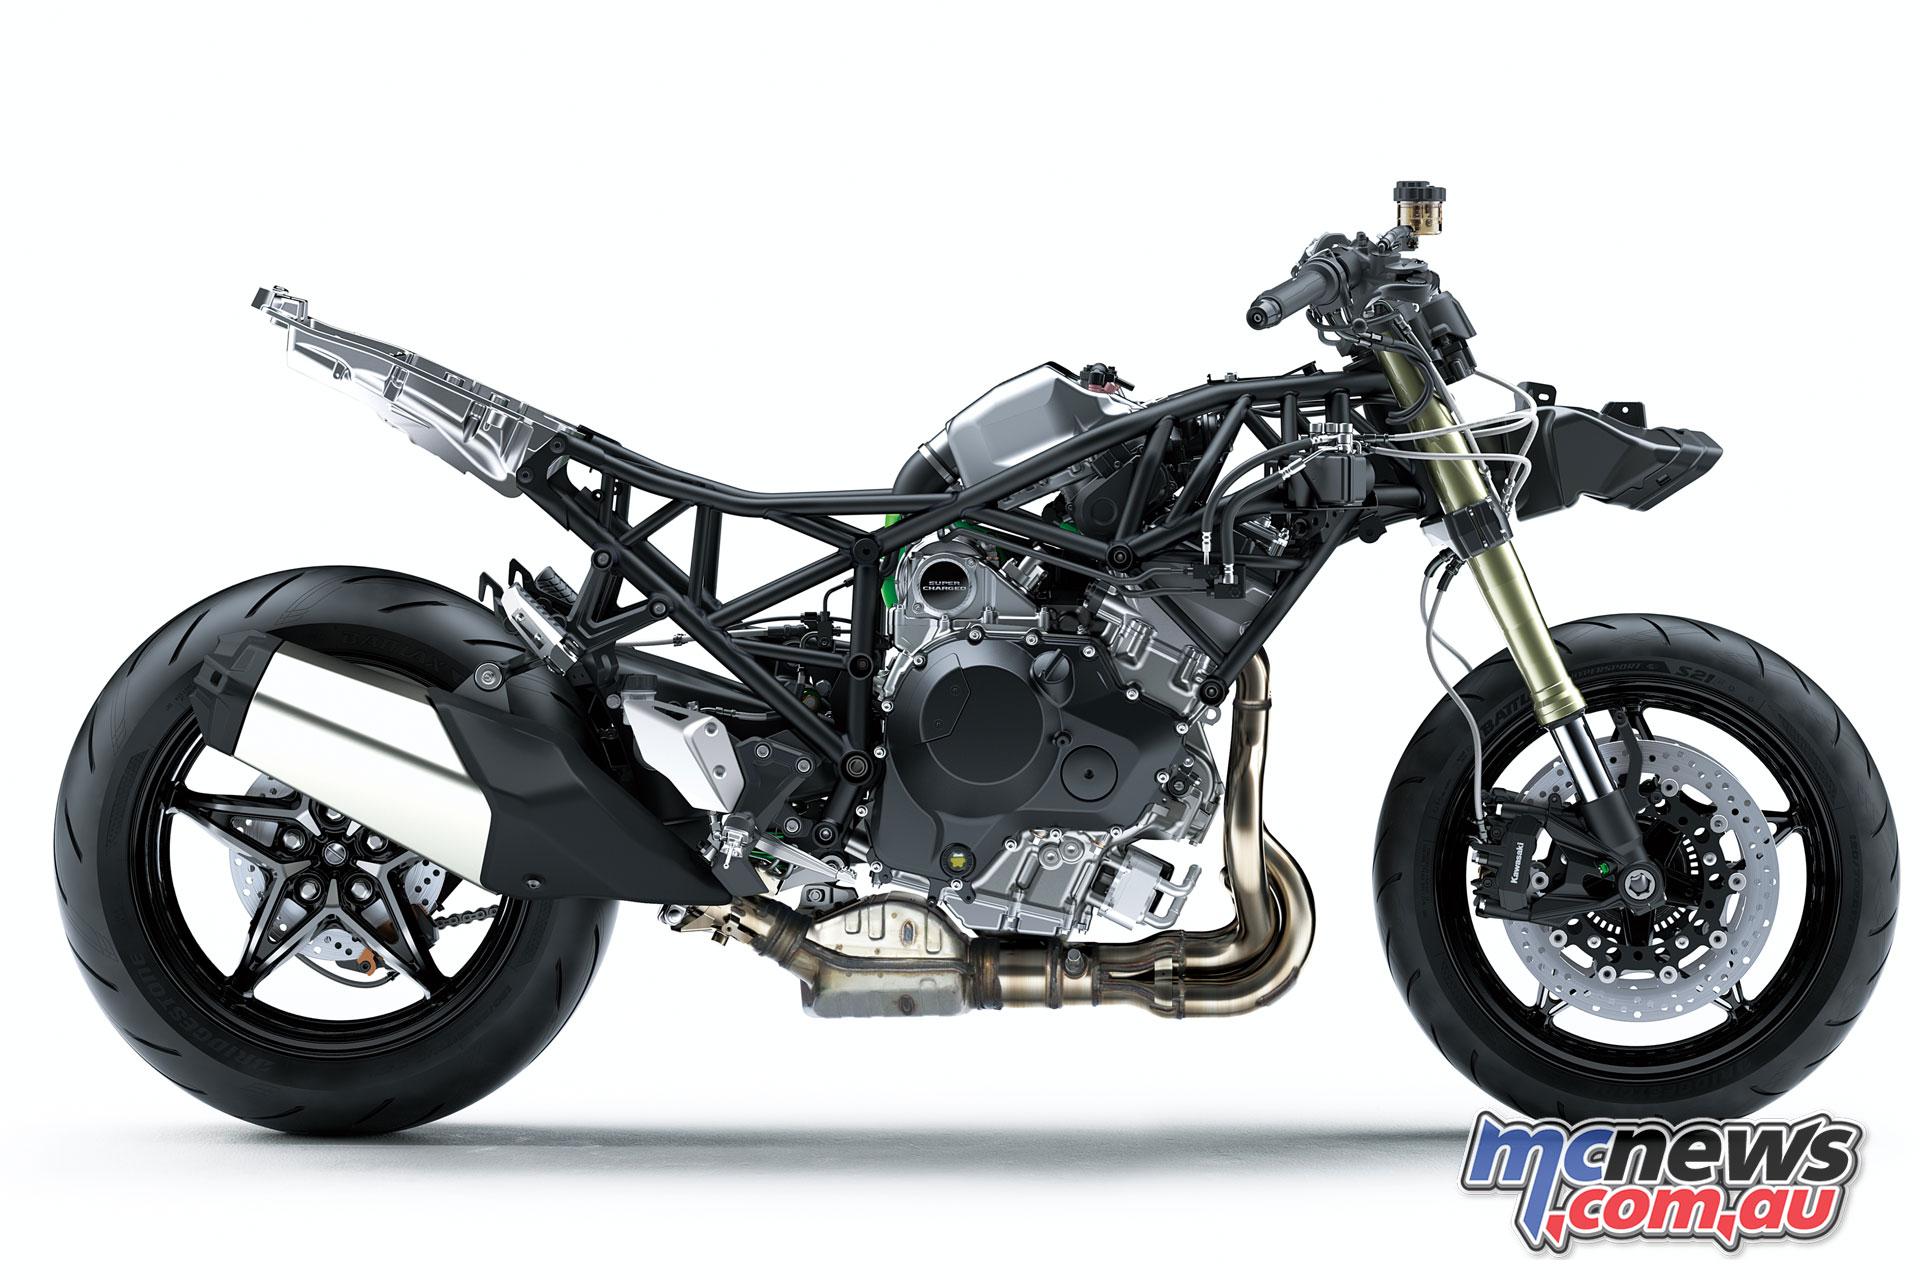 Kawasaki Ninja H2 Sx Supercharged Sports Tourer Mcnewscomau